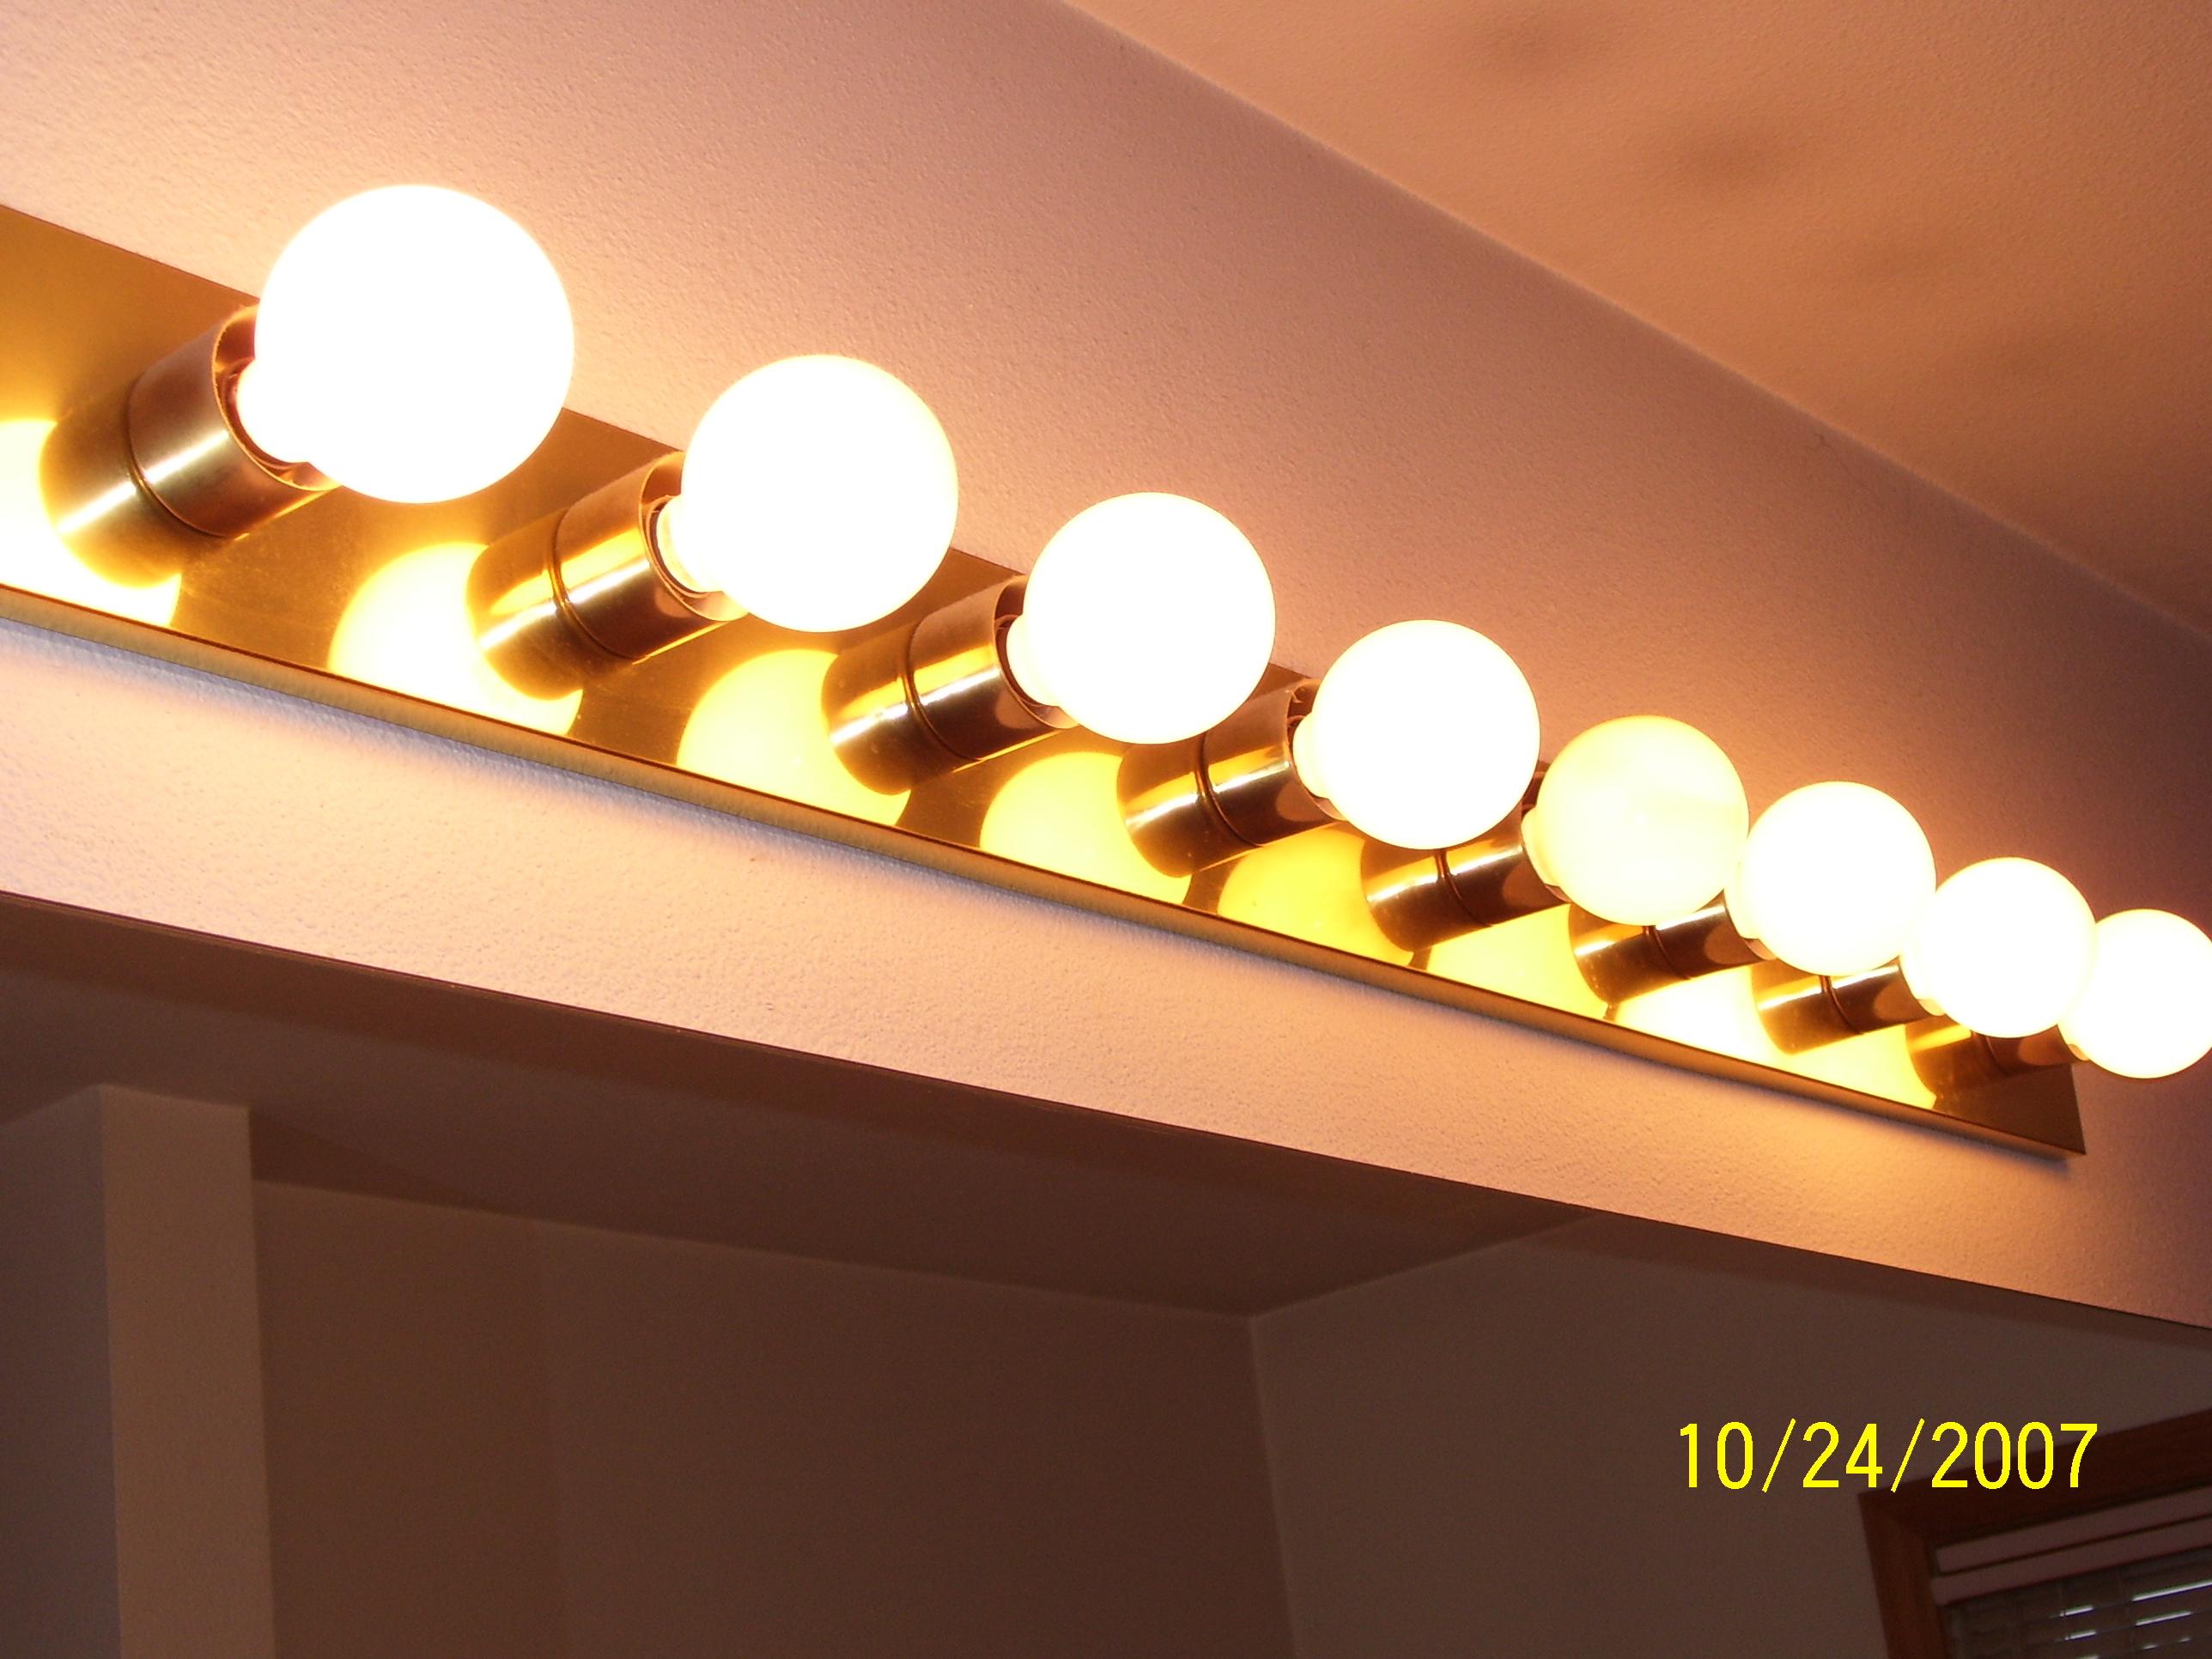 Big jim s home repairBathroom Light Strip Pinterest teki En Iyi 8 Led Strip Lights In  . Repair Bathroom Light Fixture. Home Design Ideas